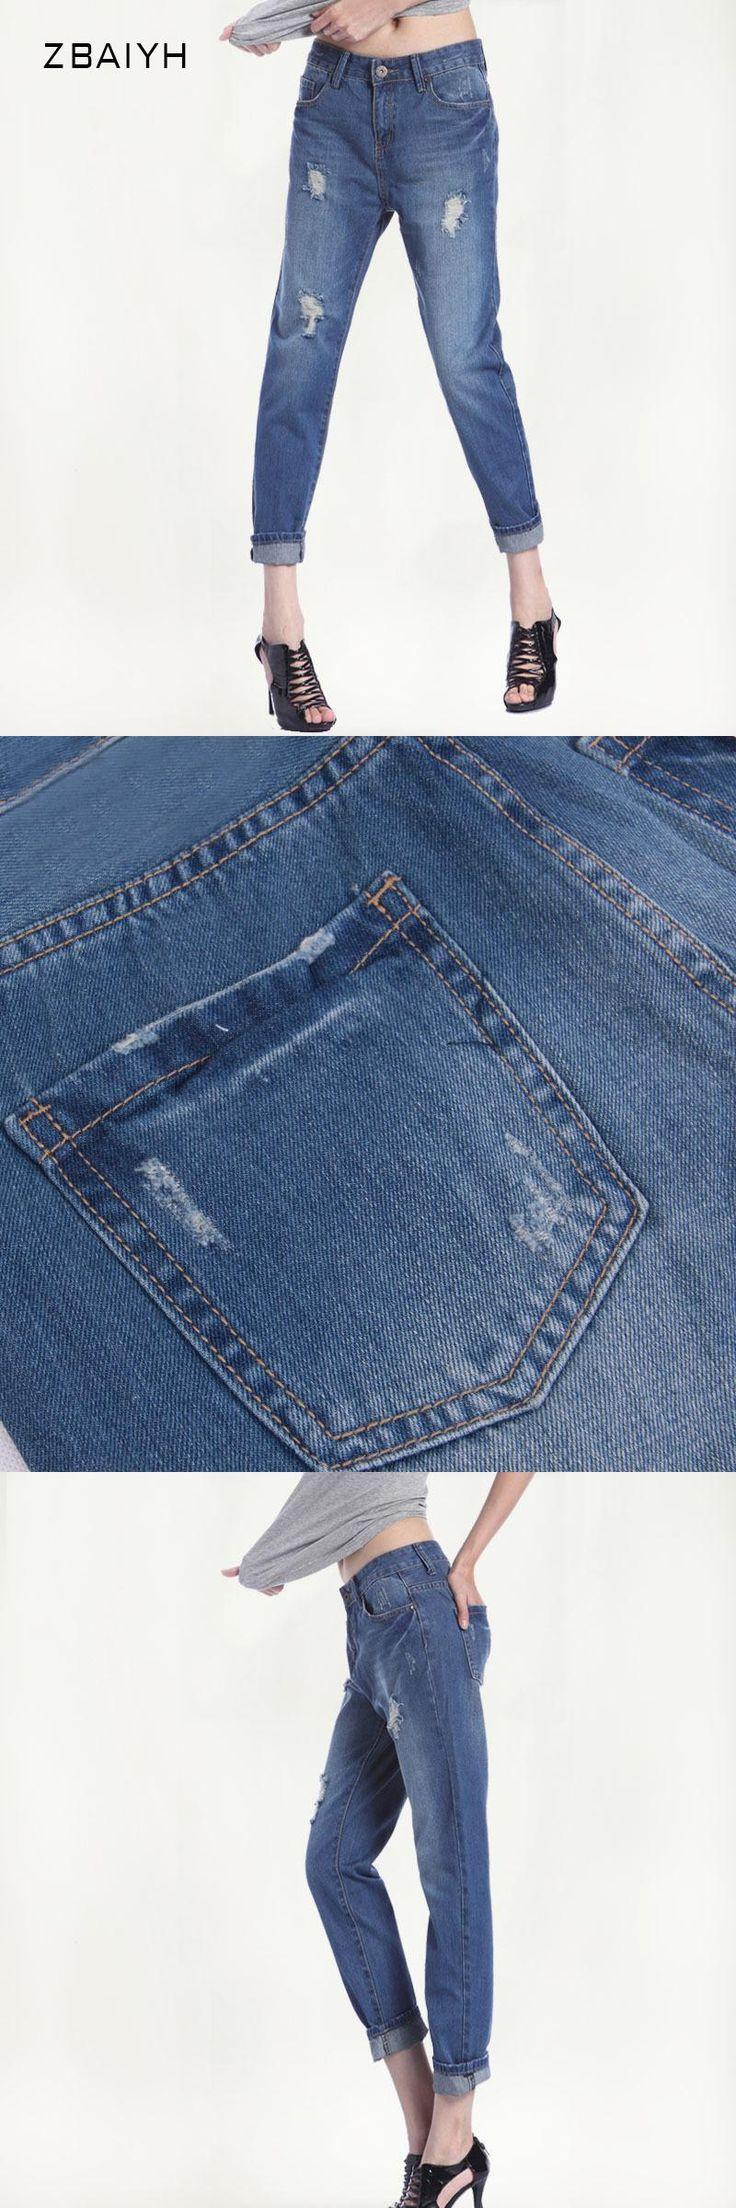 ZBAIYH High Waist Jeans Women 2017 Autumn Hole Retro Jean Boyfriend Femme Vaqueros Mujer Plus Size Jeans For Womens Denim Pants